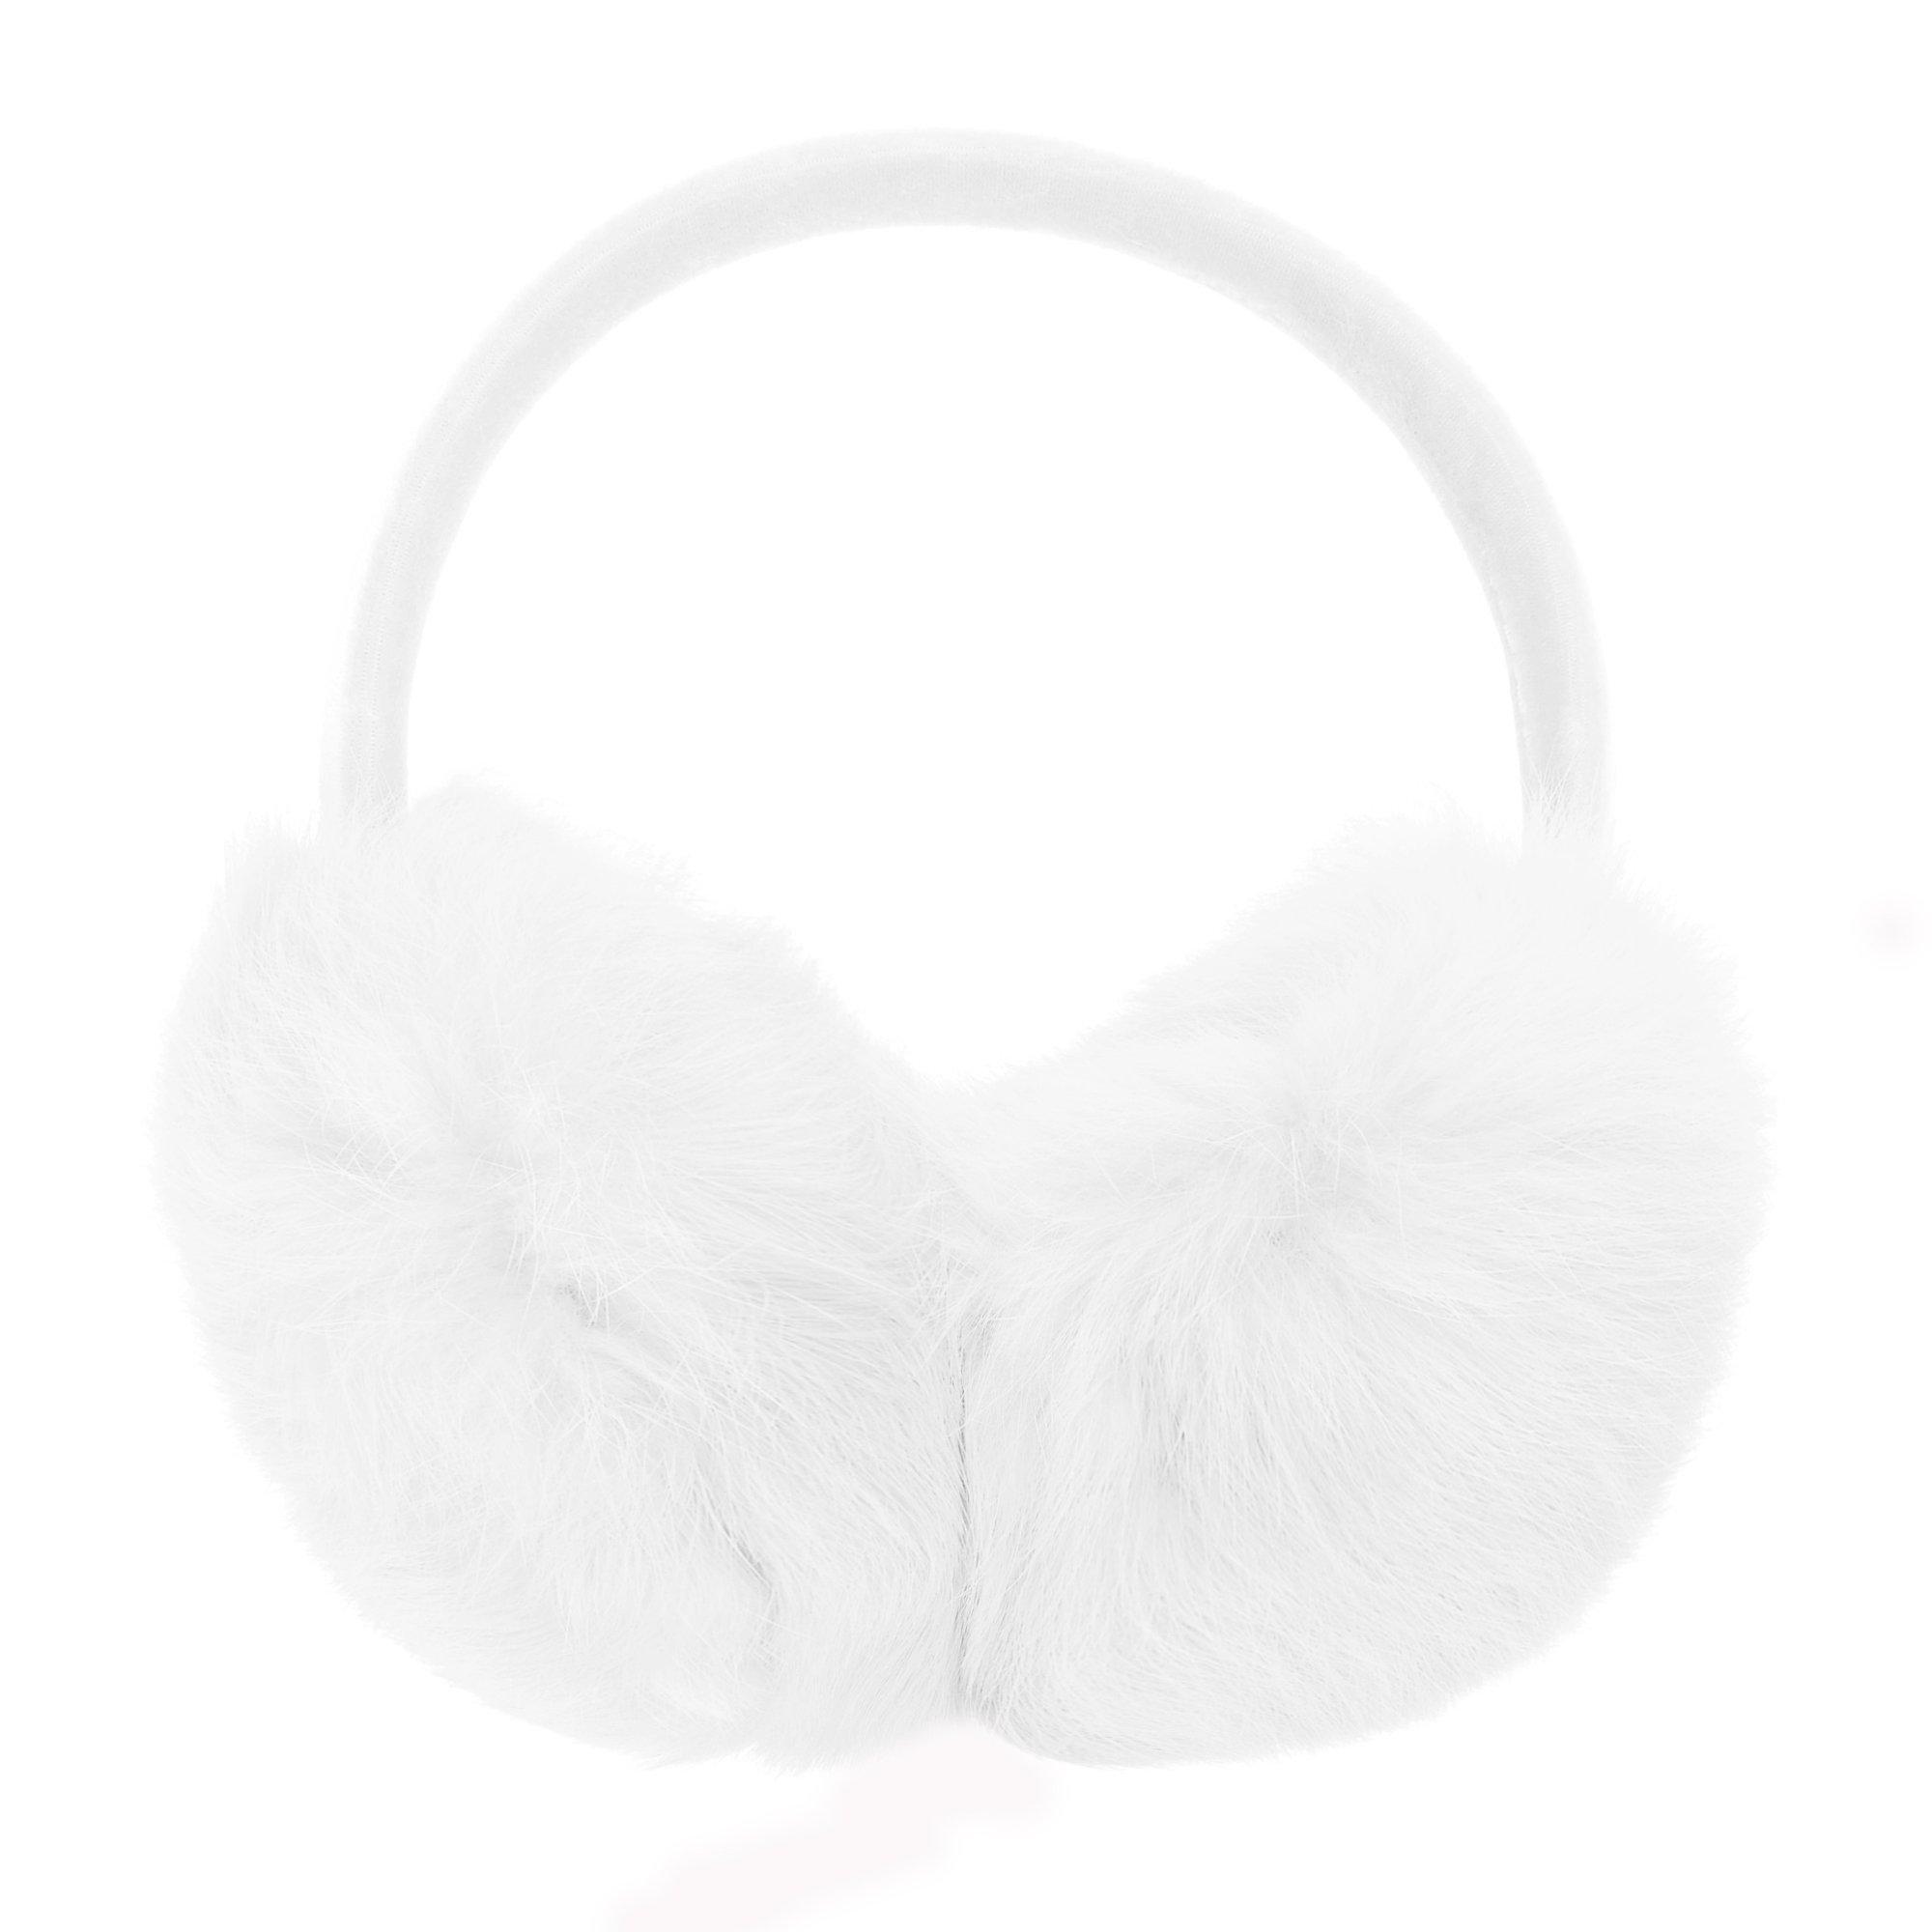 ZLYC Womens Girls Genuine Rabbit Fur EarMuffs Adjustable Ear Warmers, White